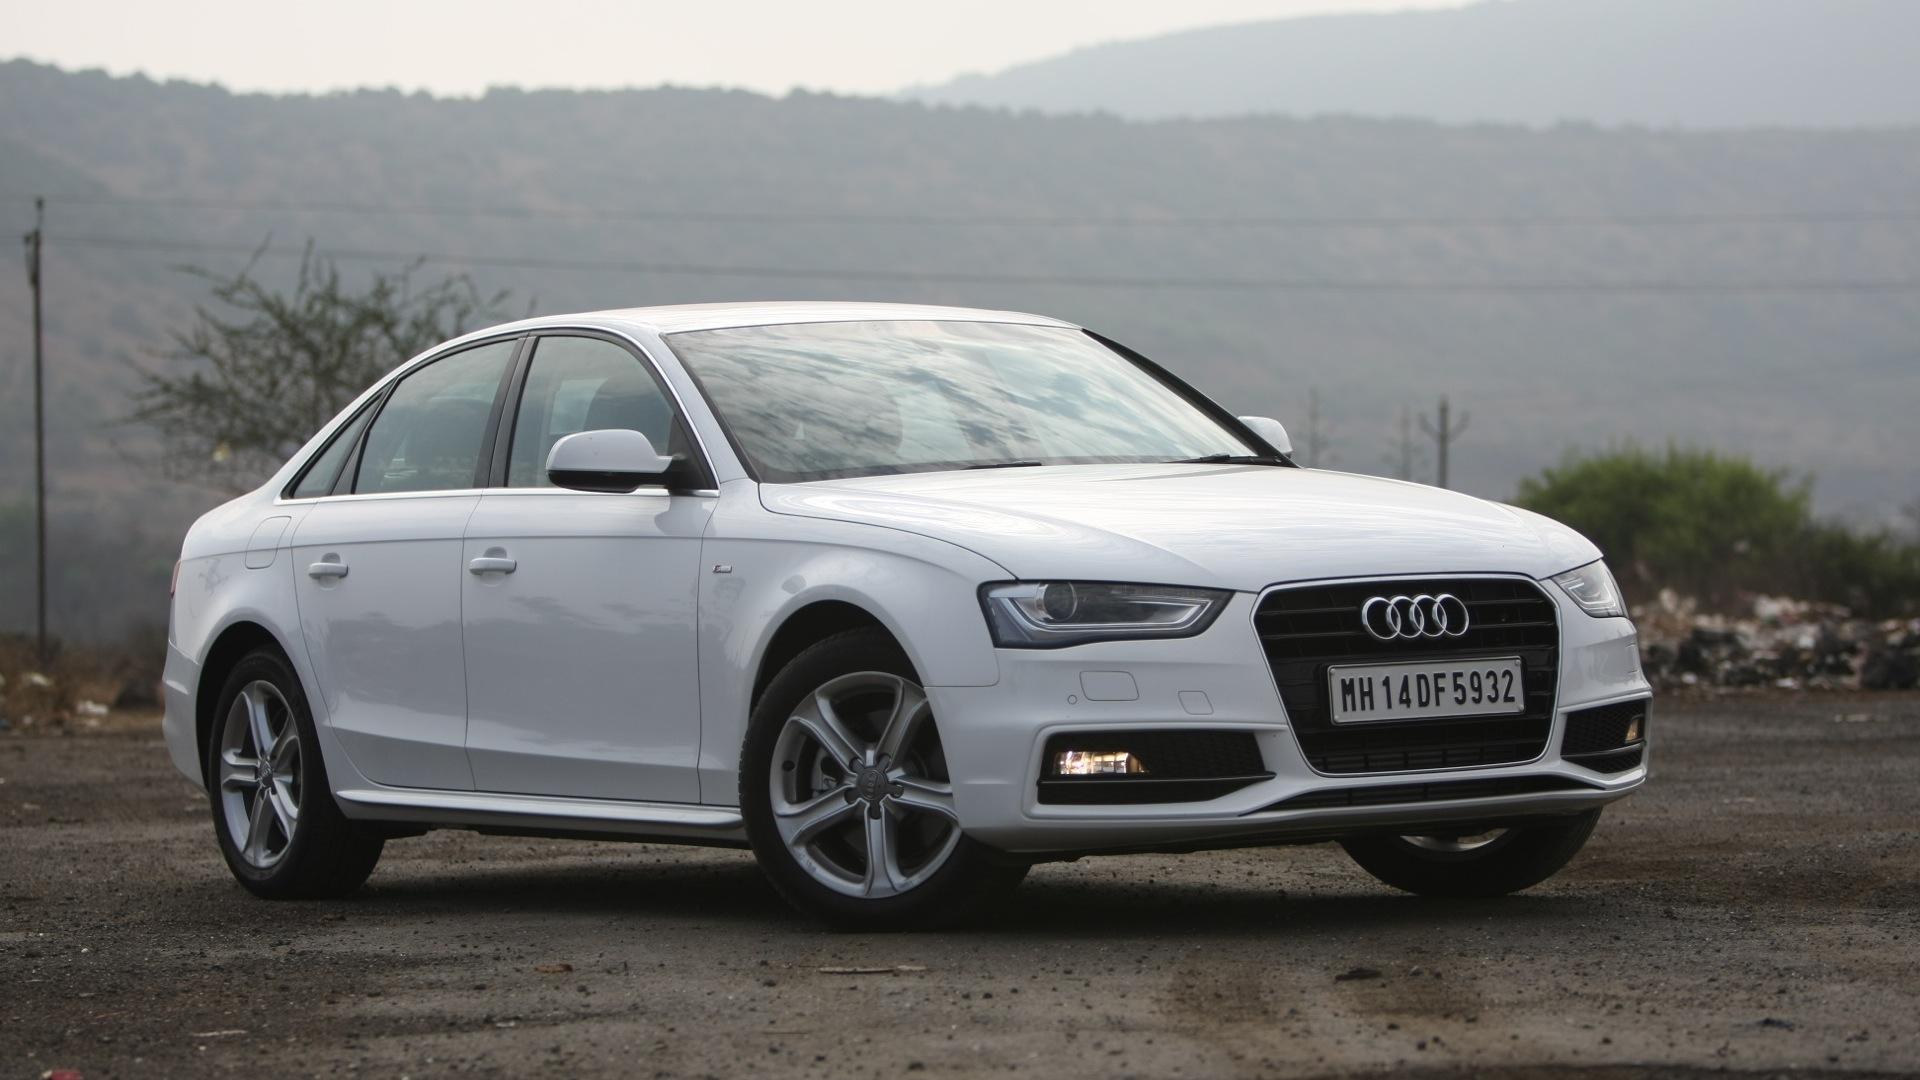 Audi A4 2014 35 TFSI Premium